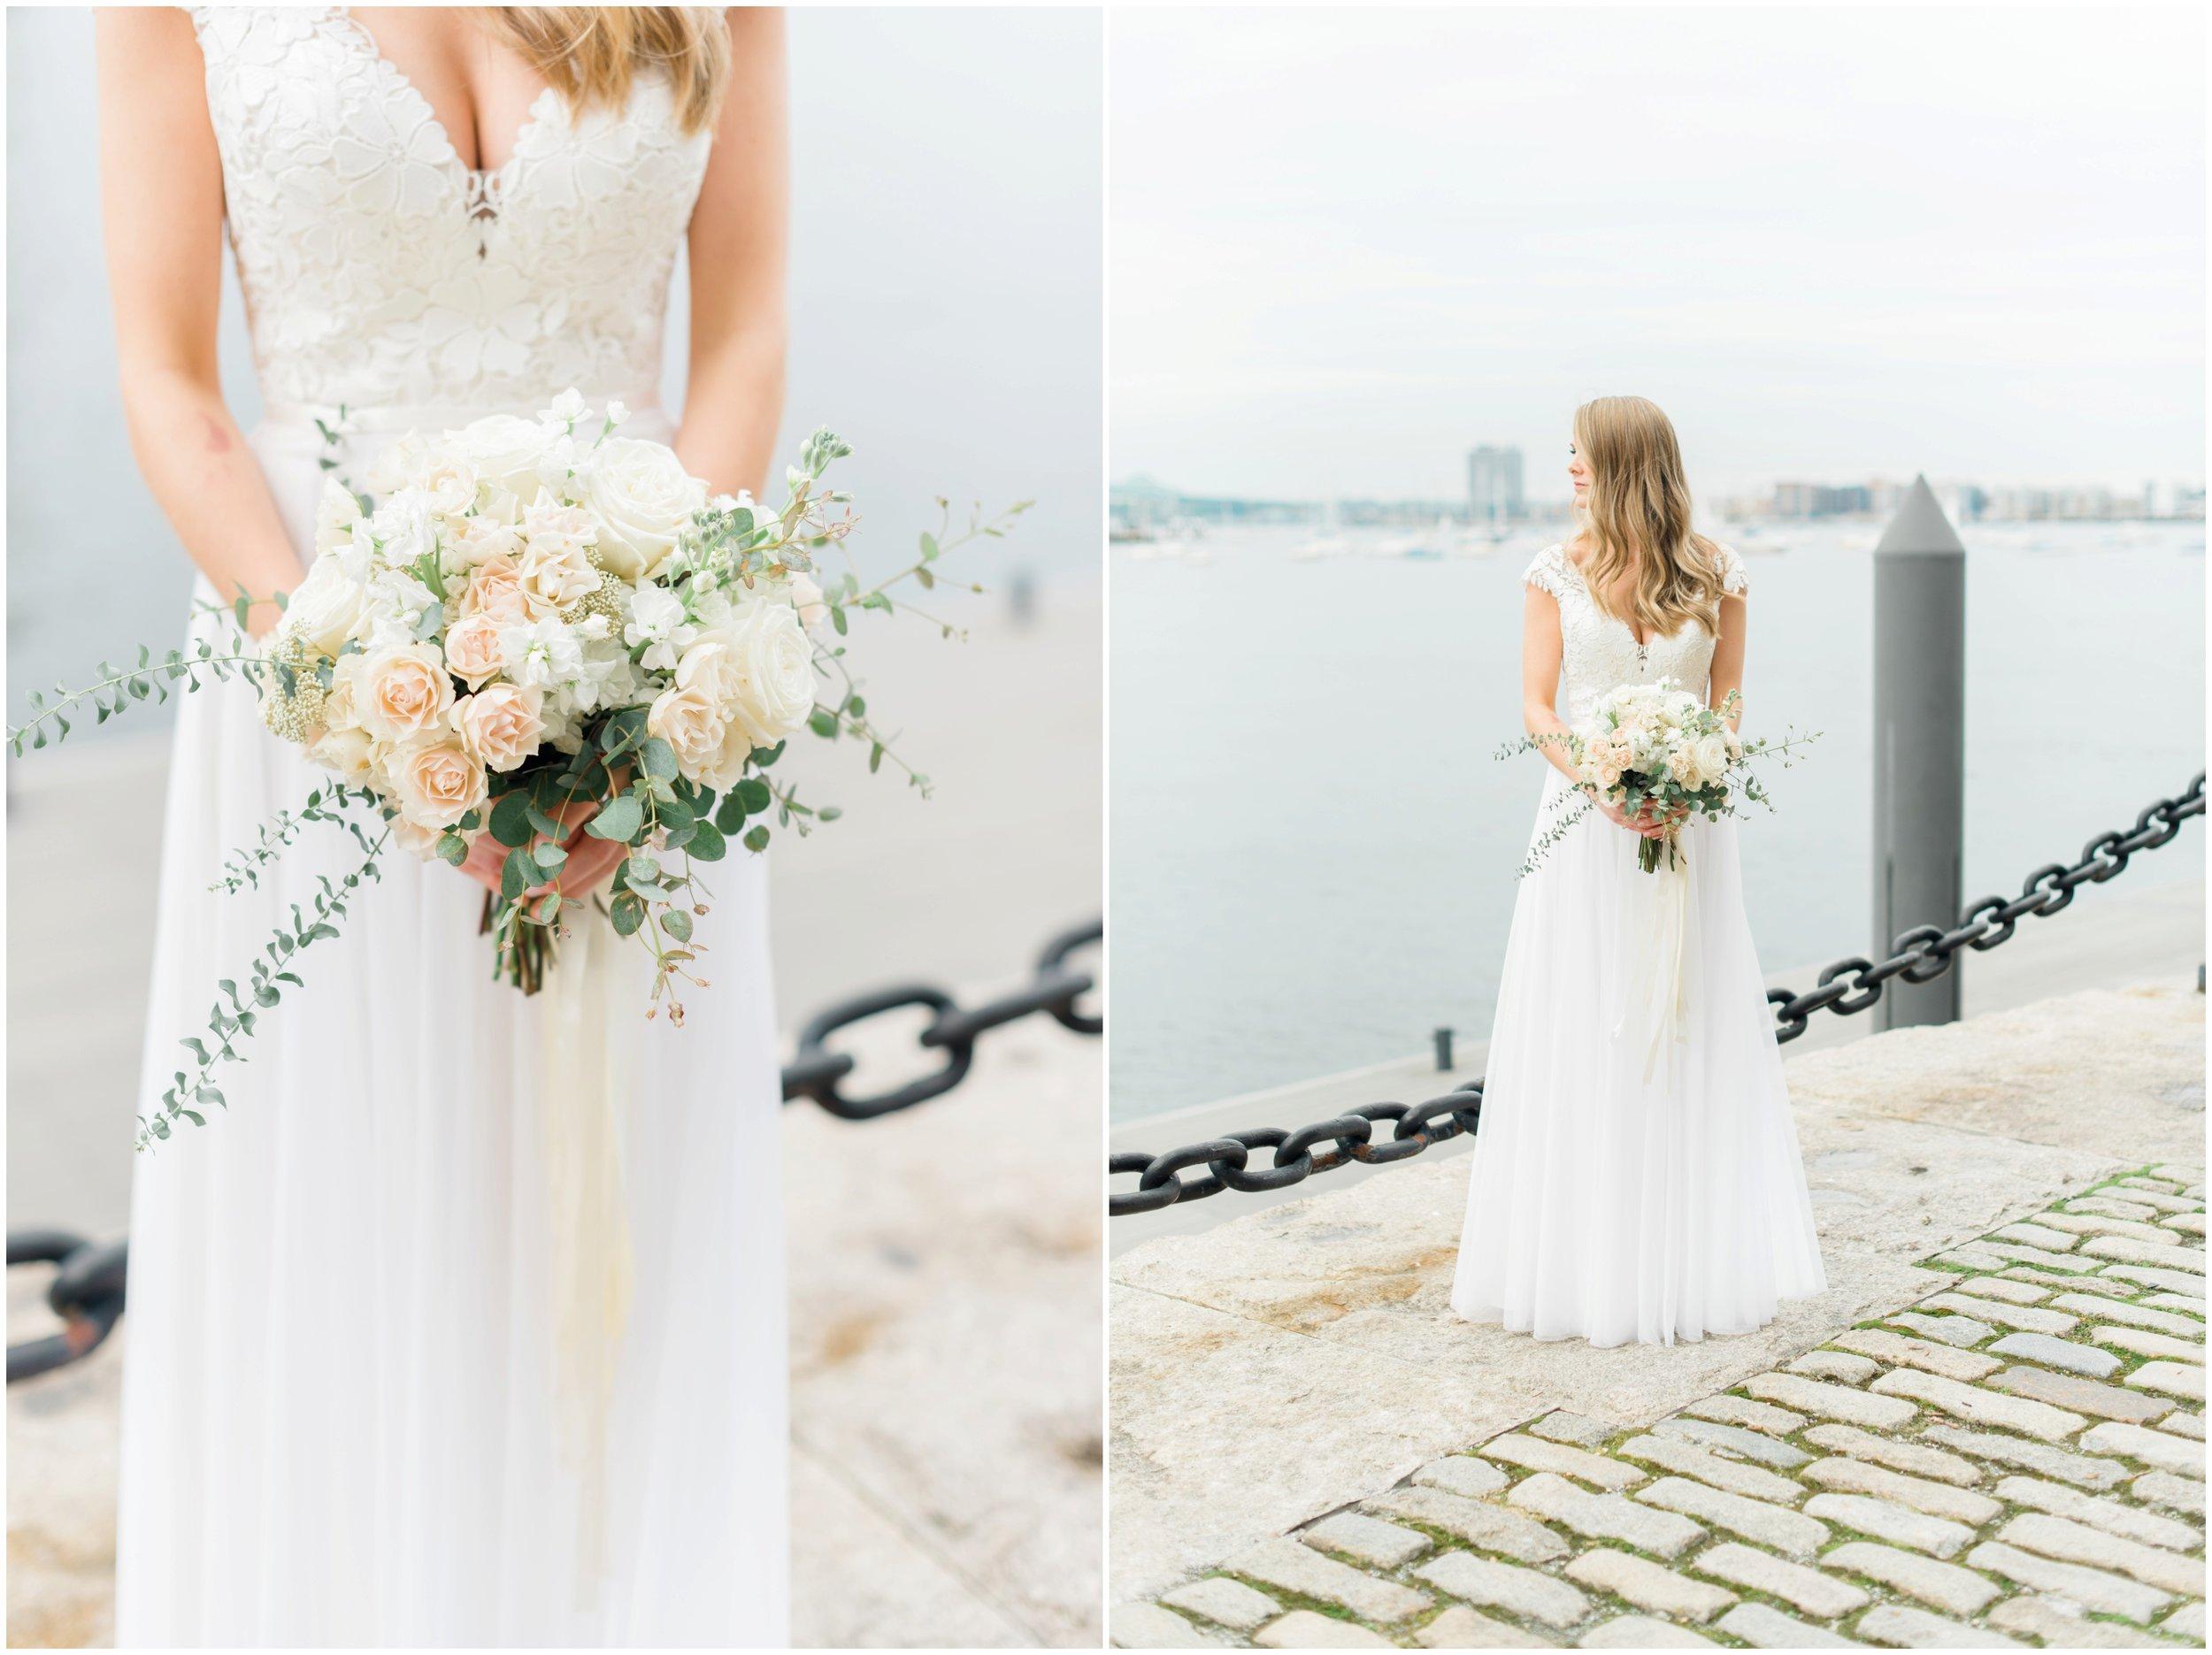 jay-robin-married-row-34-boston-18.jpg